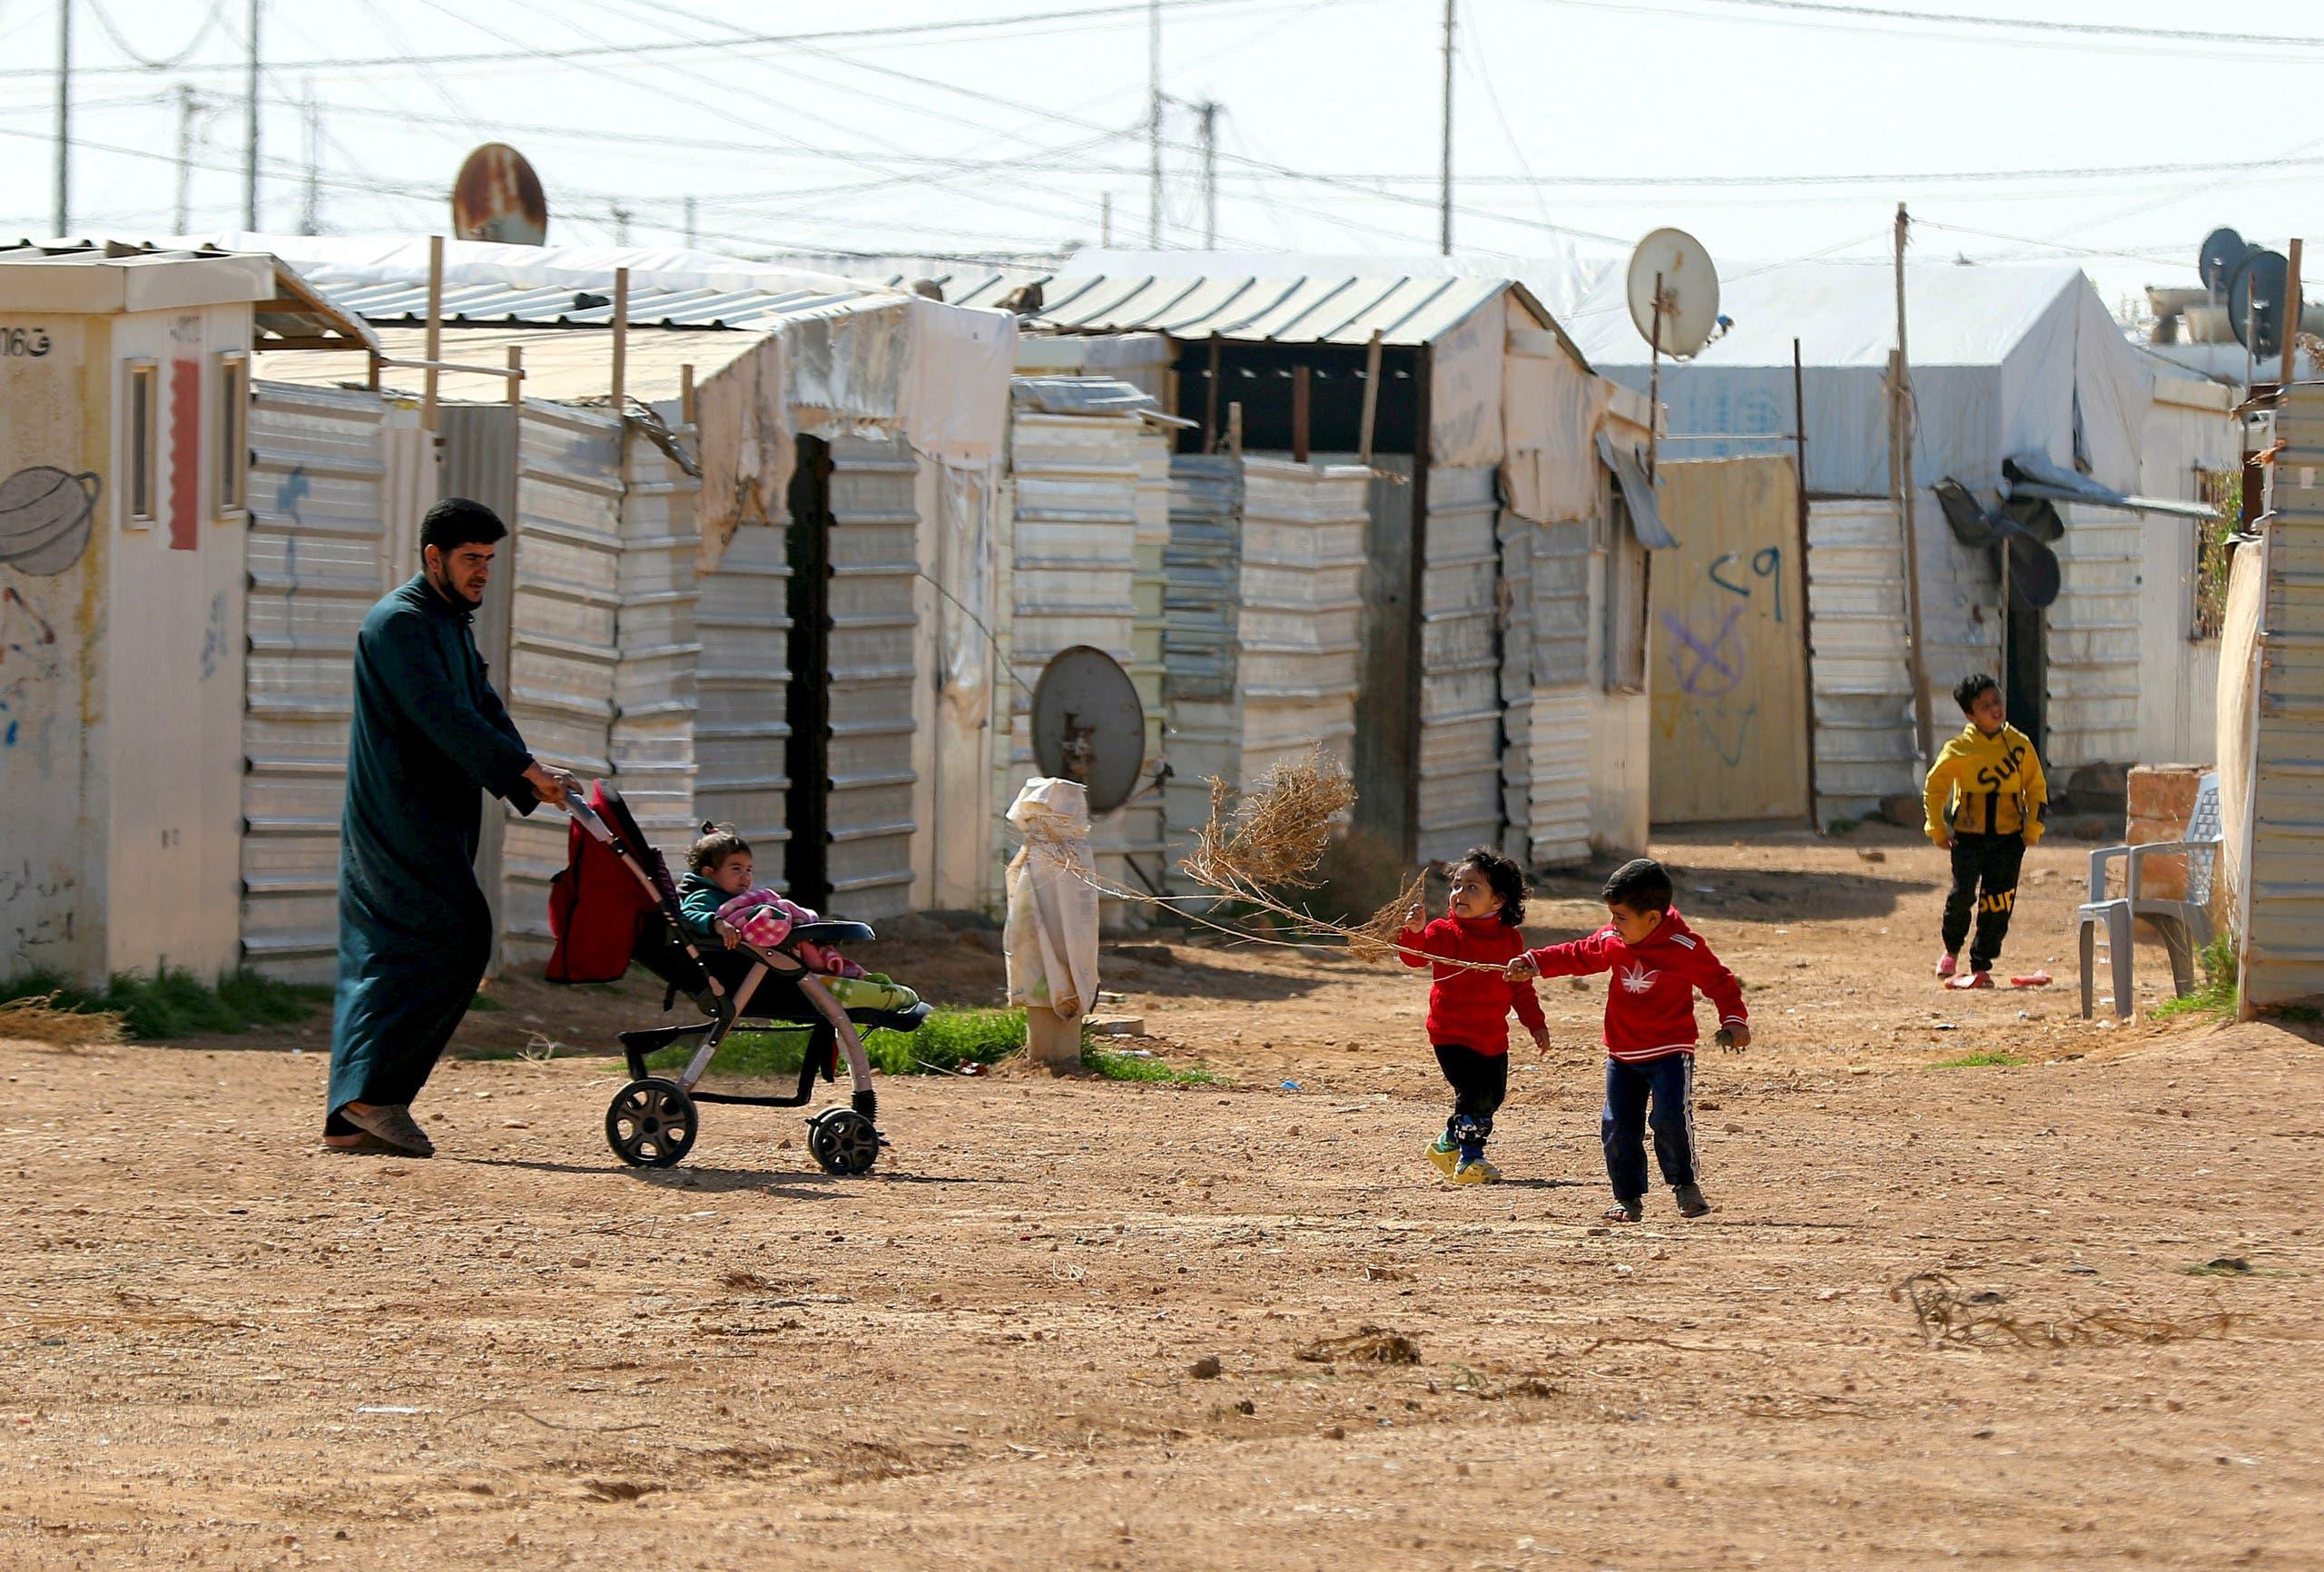 Syrian children play in the Zaatari refugee camp, 80 kilometers (50 miles) north of the Jordanian capital Amman on February 15, 2021.